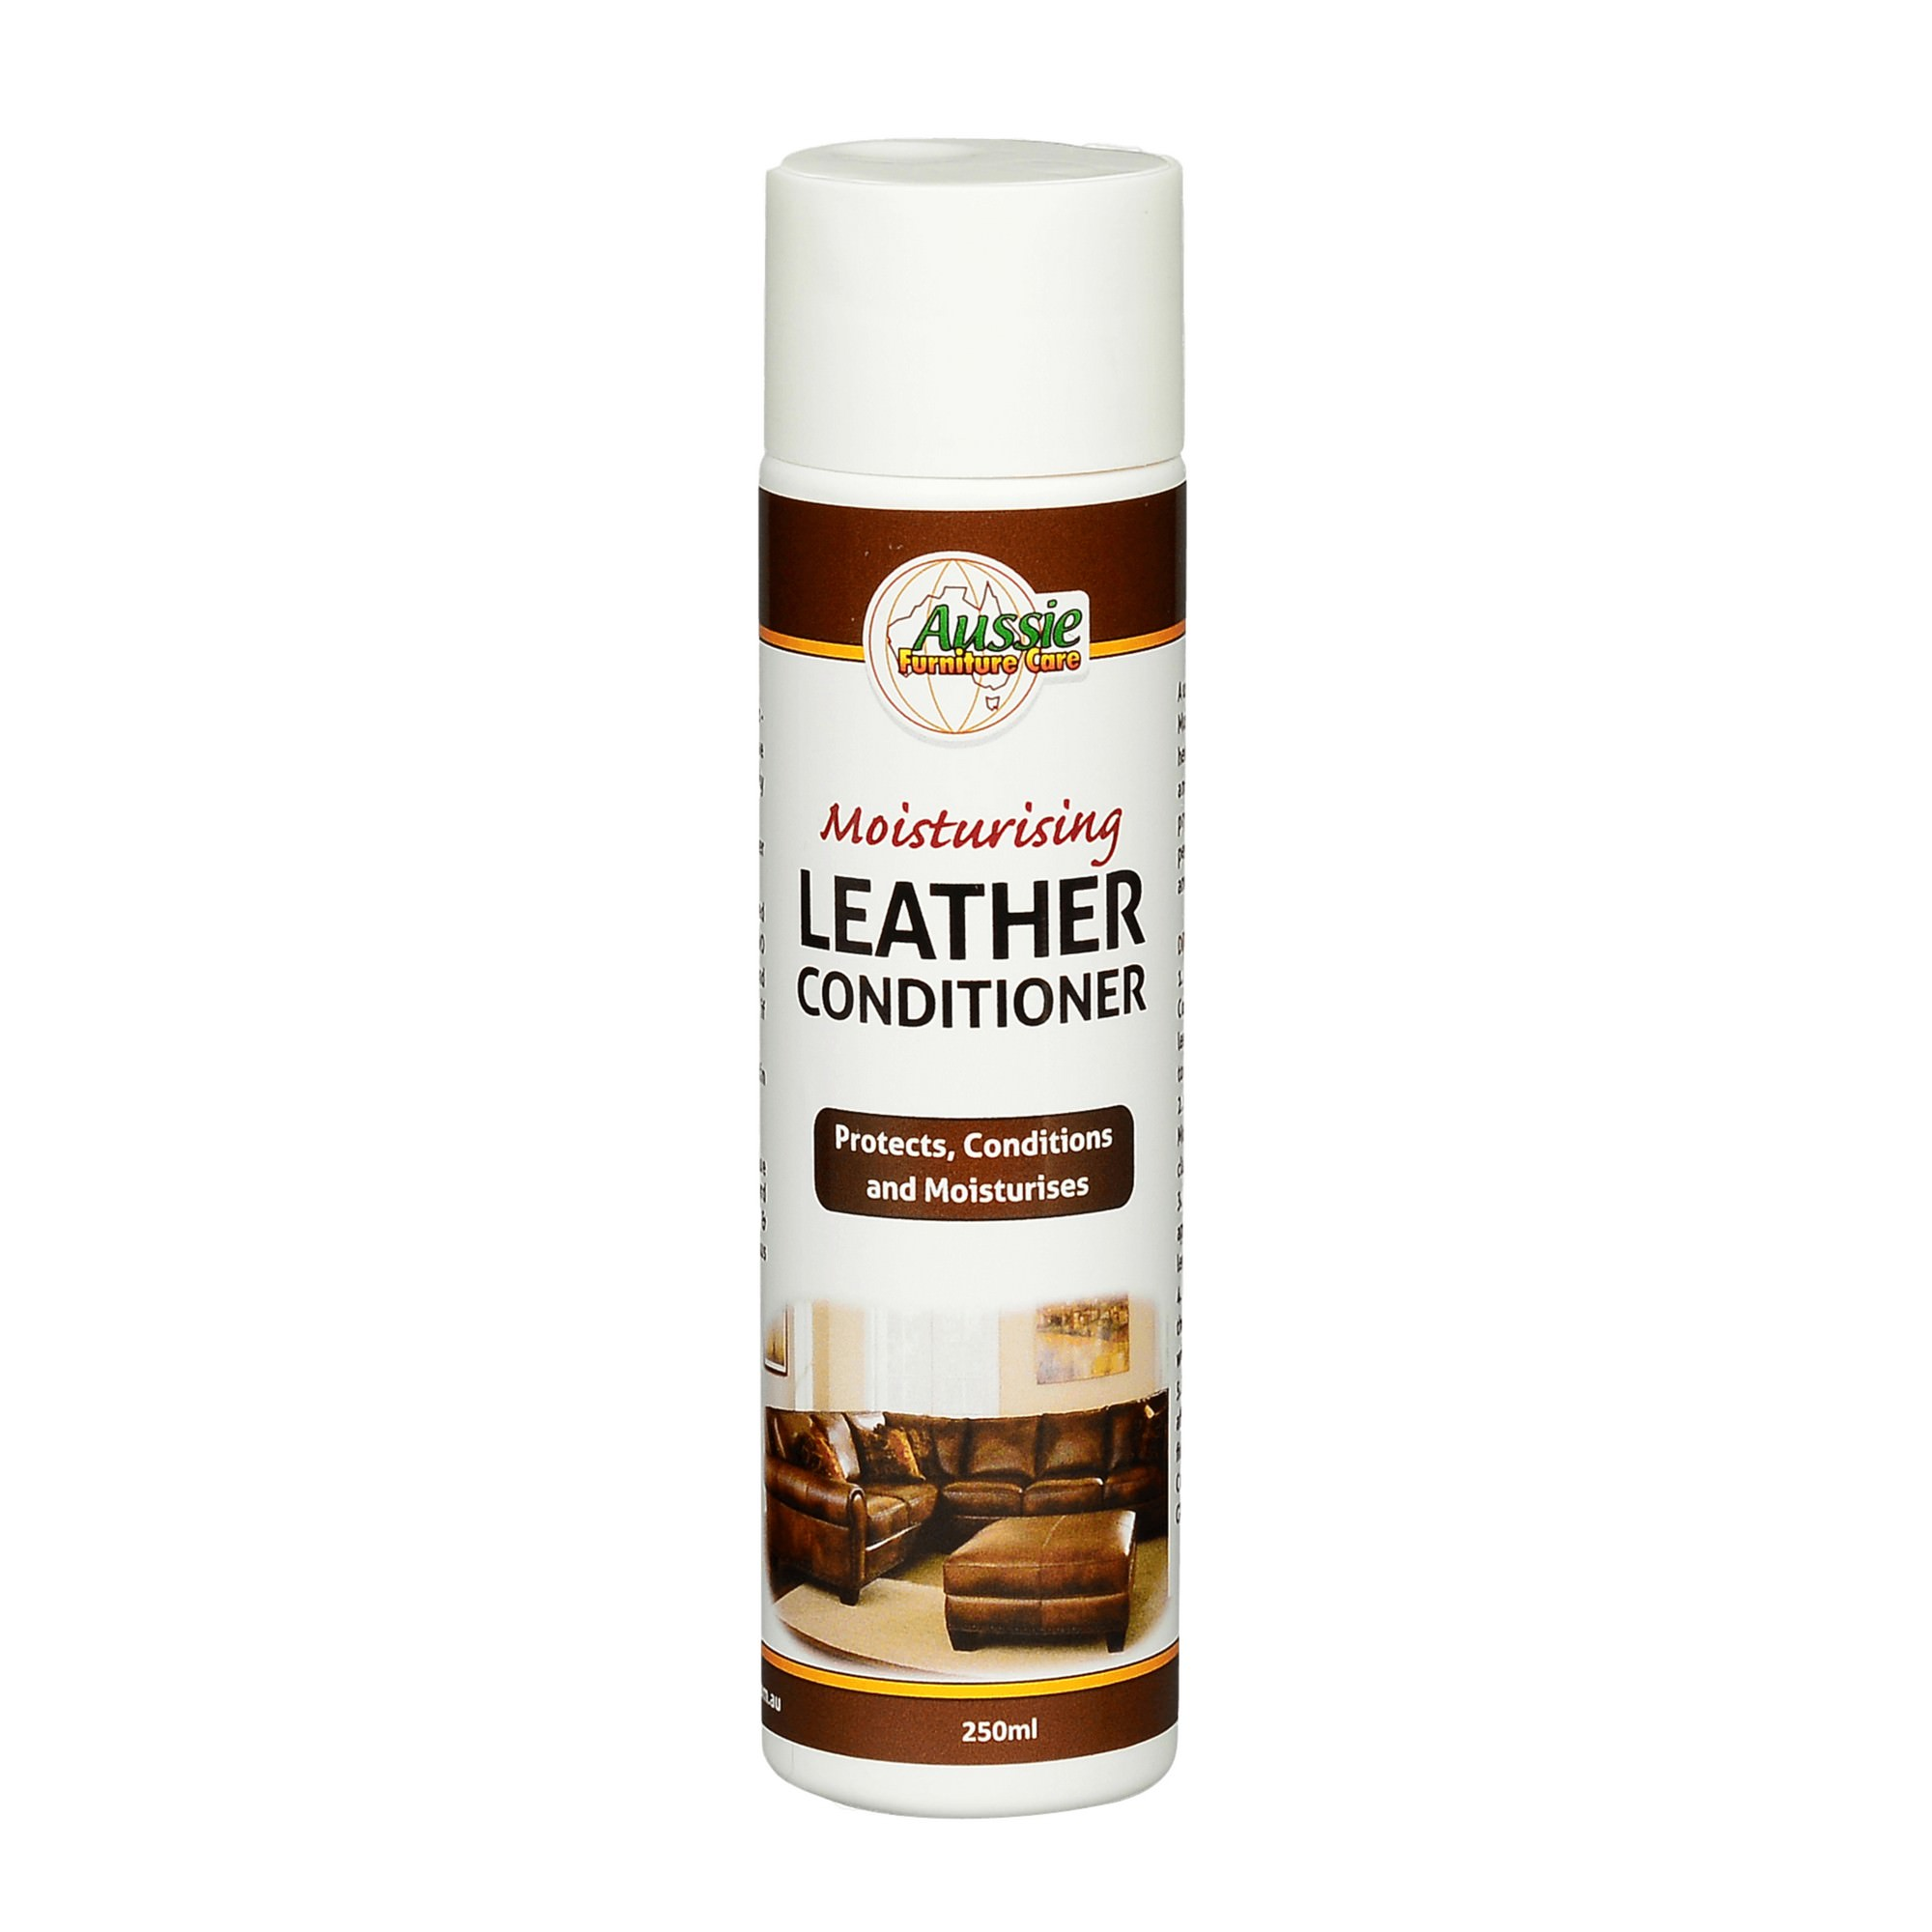 AFC Leather Conditioning Cream, 250ml